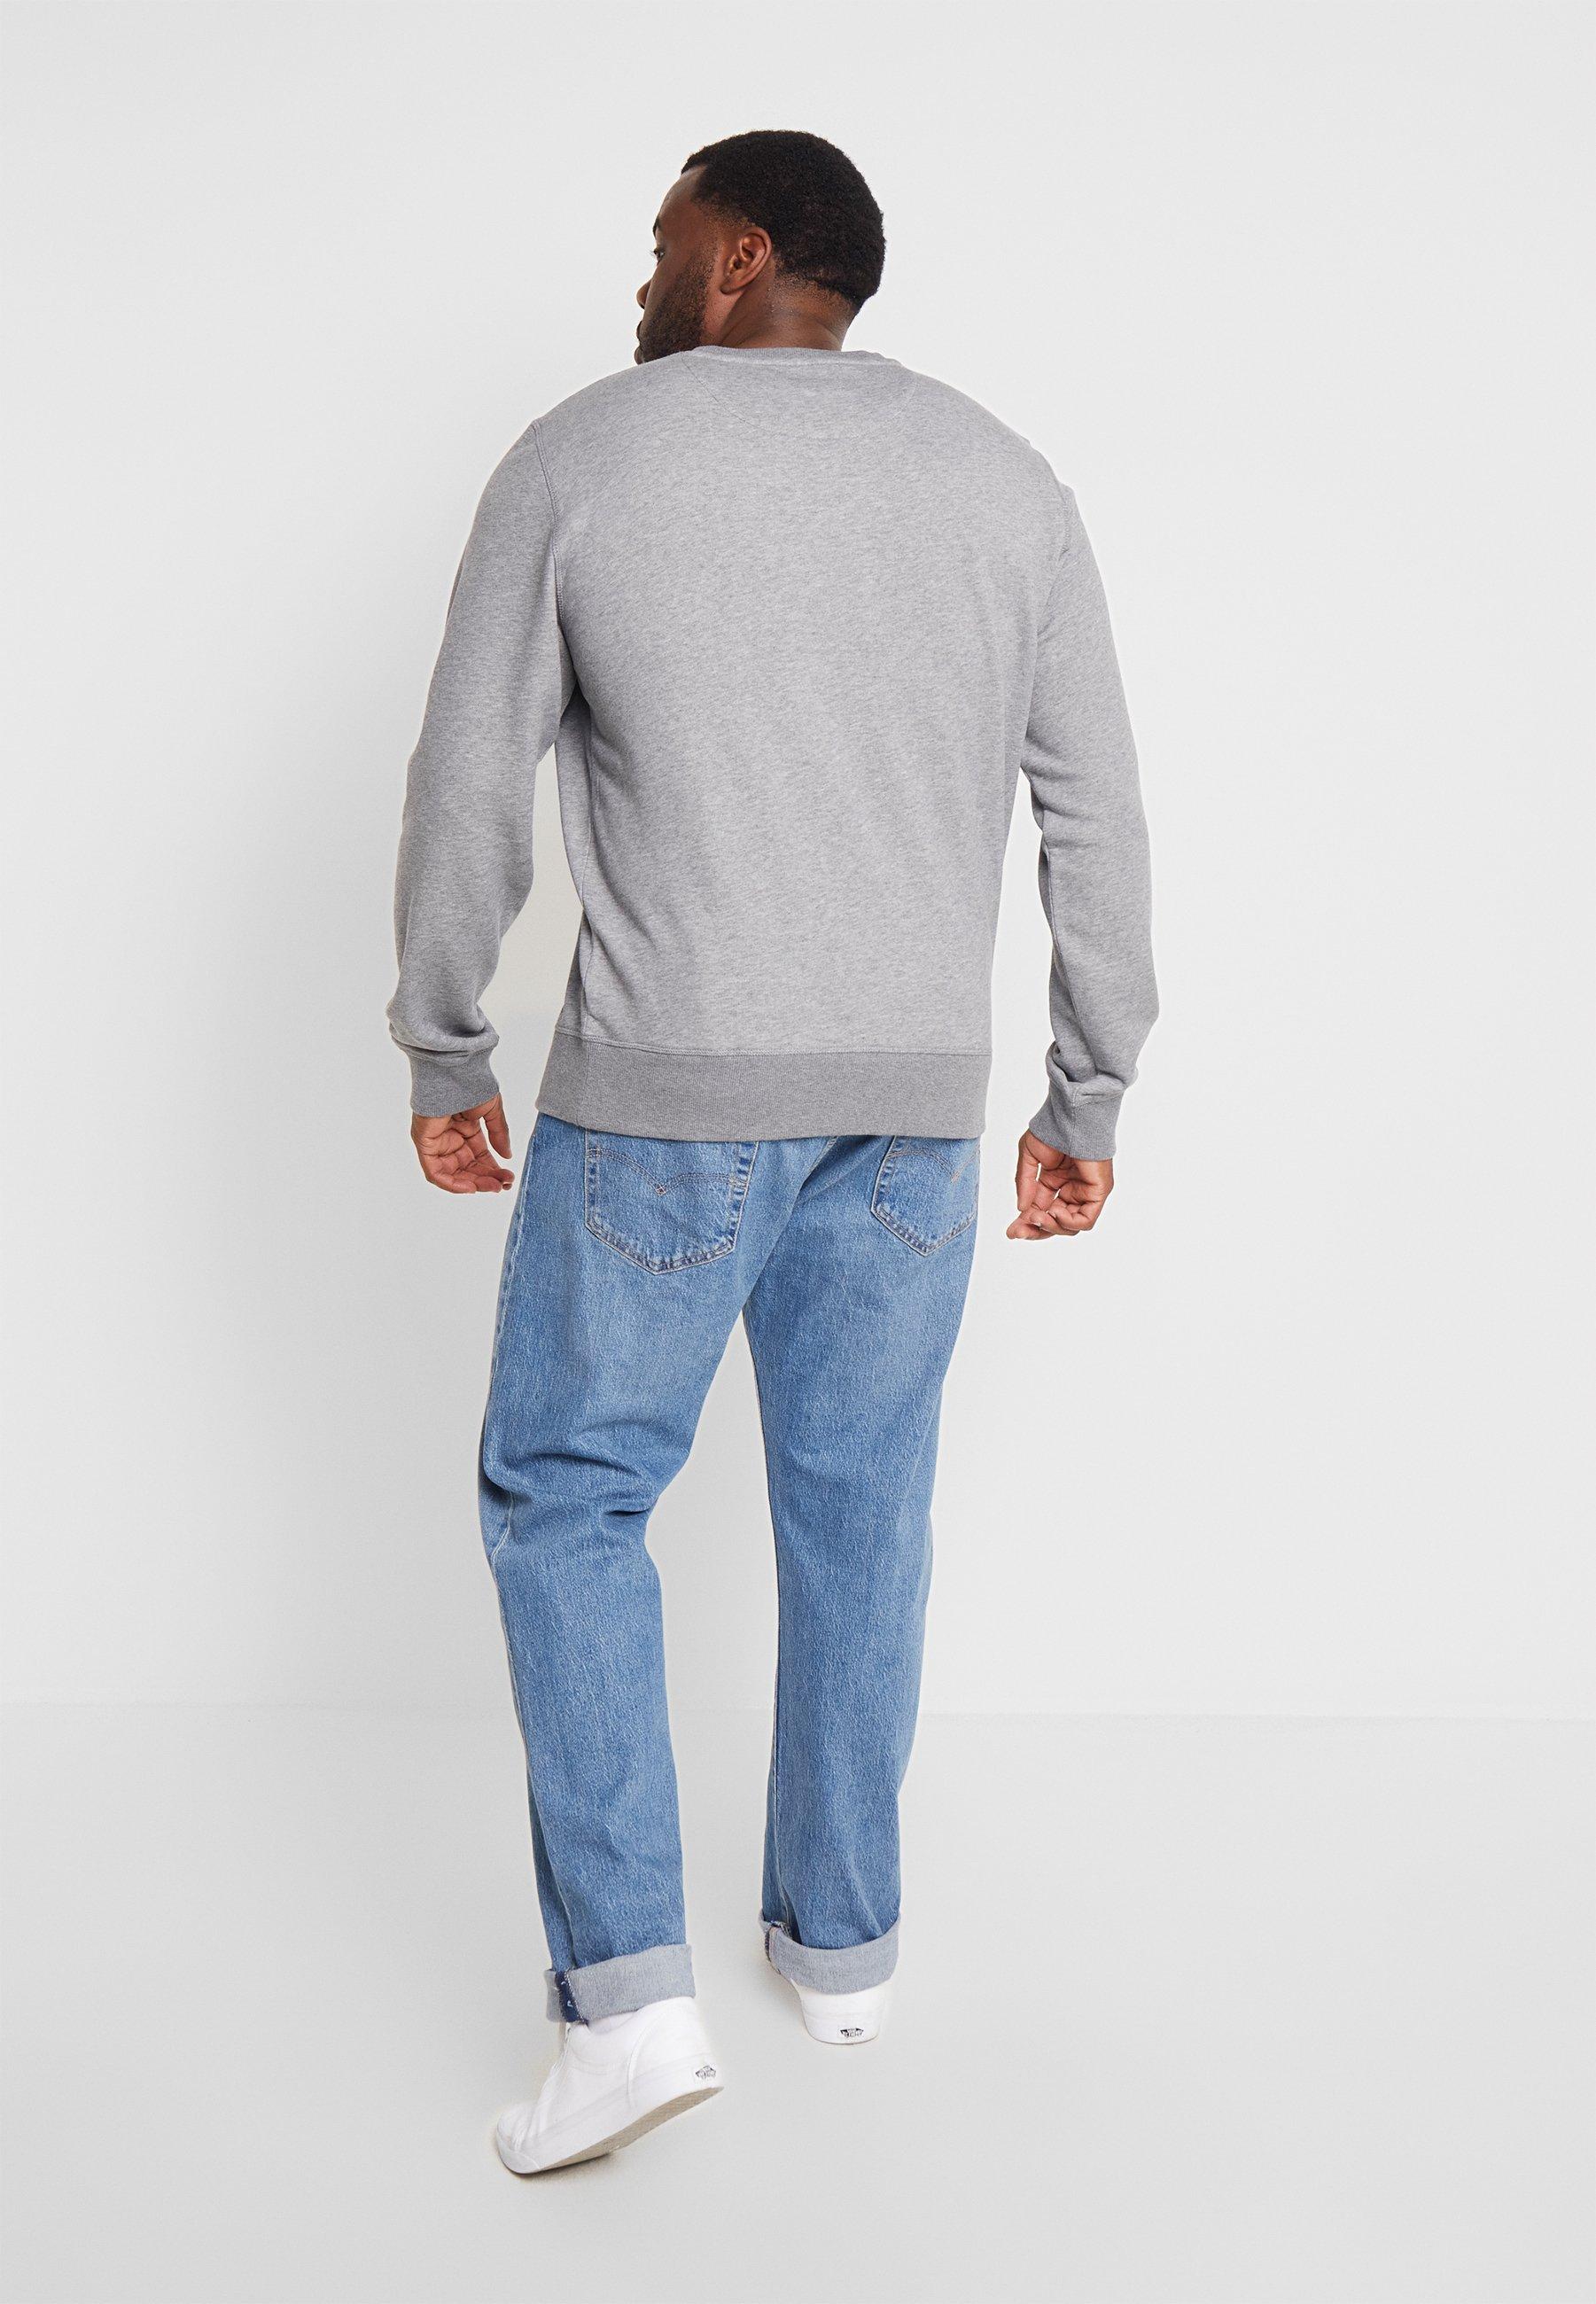 Grey Dark Original Melange The Gant C neckSweatshirt sthQCdxBr